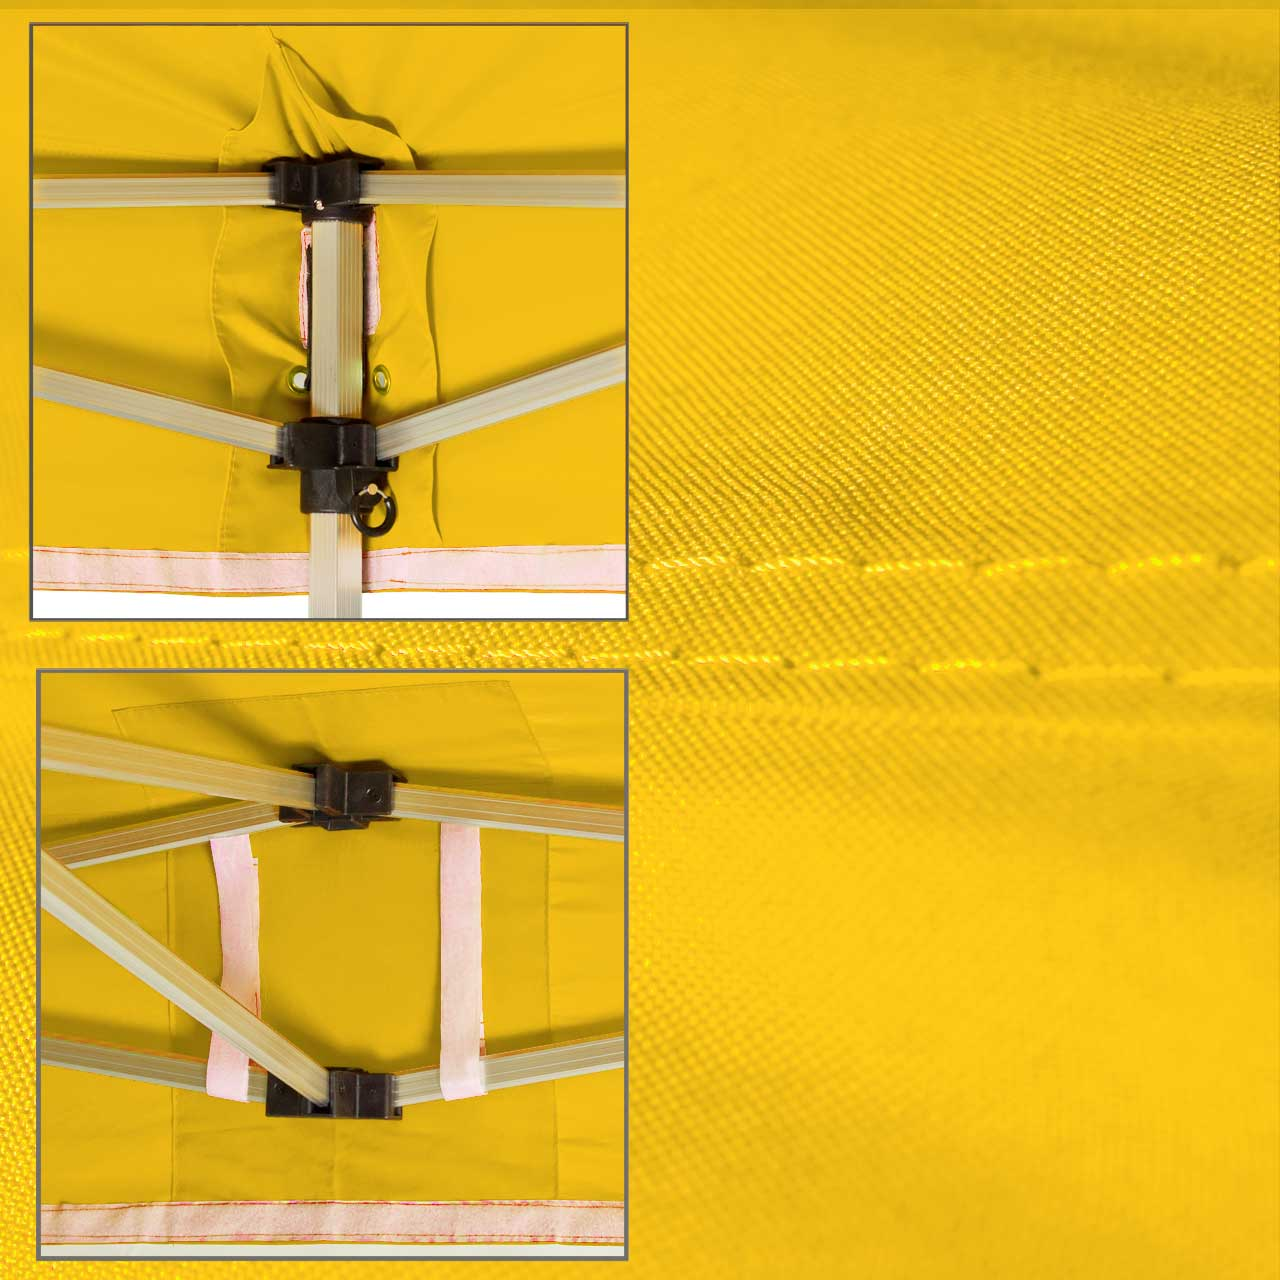 Faltpavillon-gelb-Dachplane